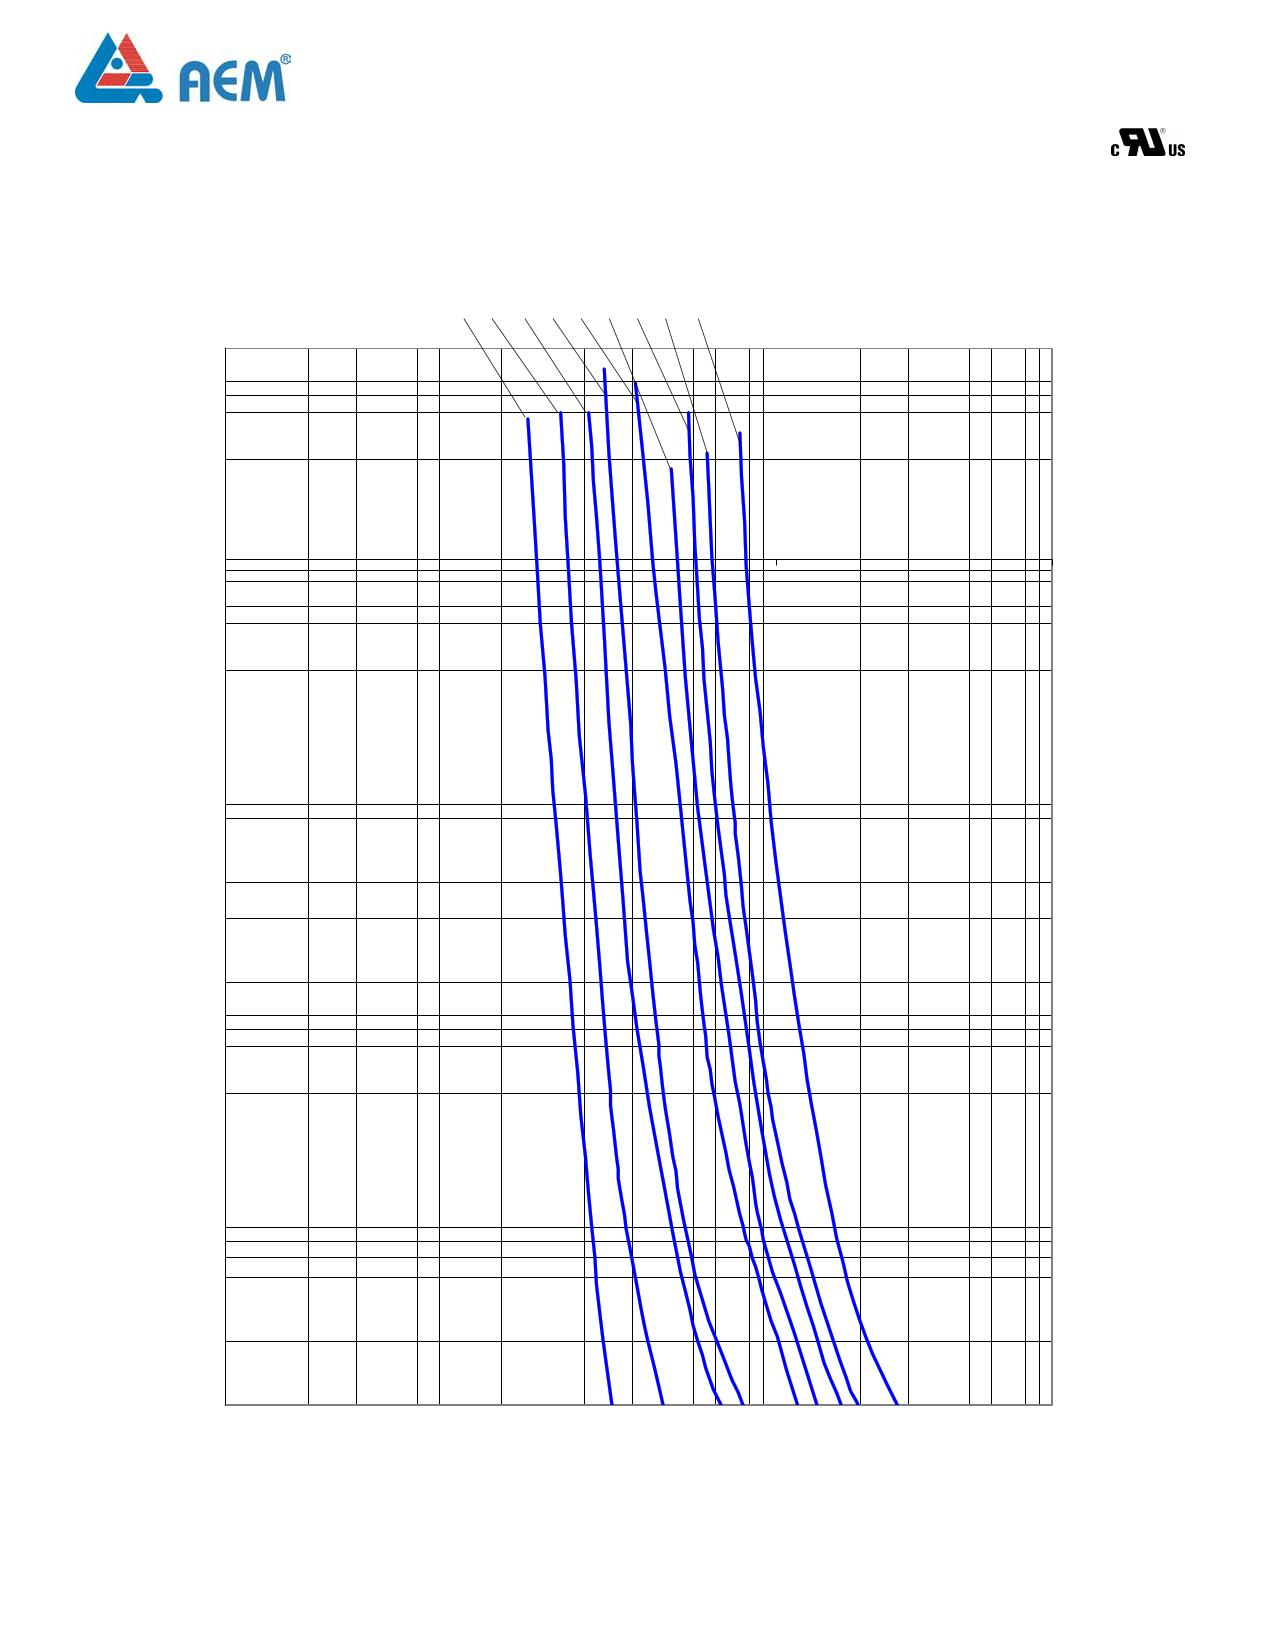 F0603FF1000V032T arduino